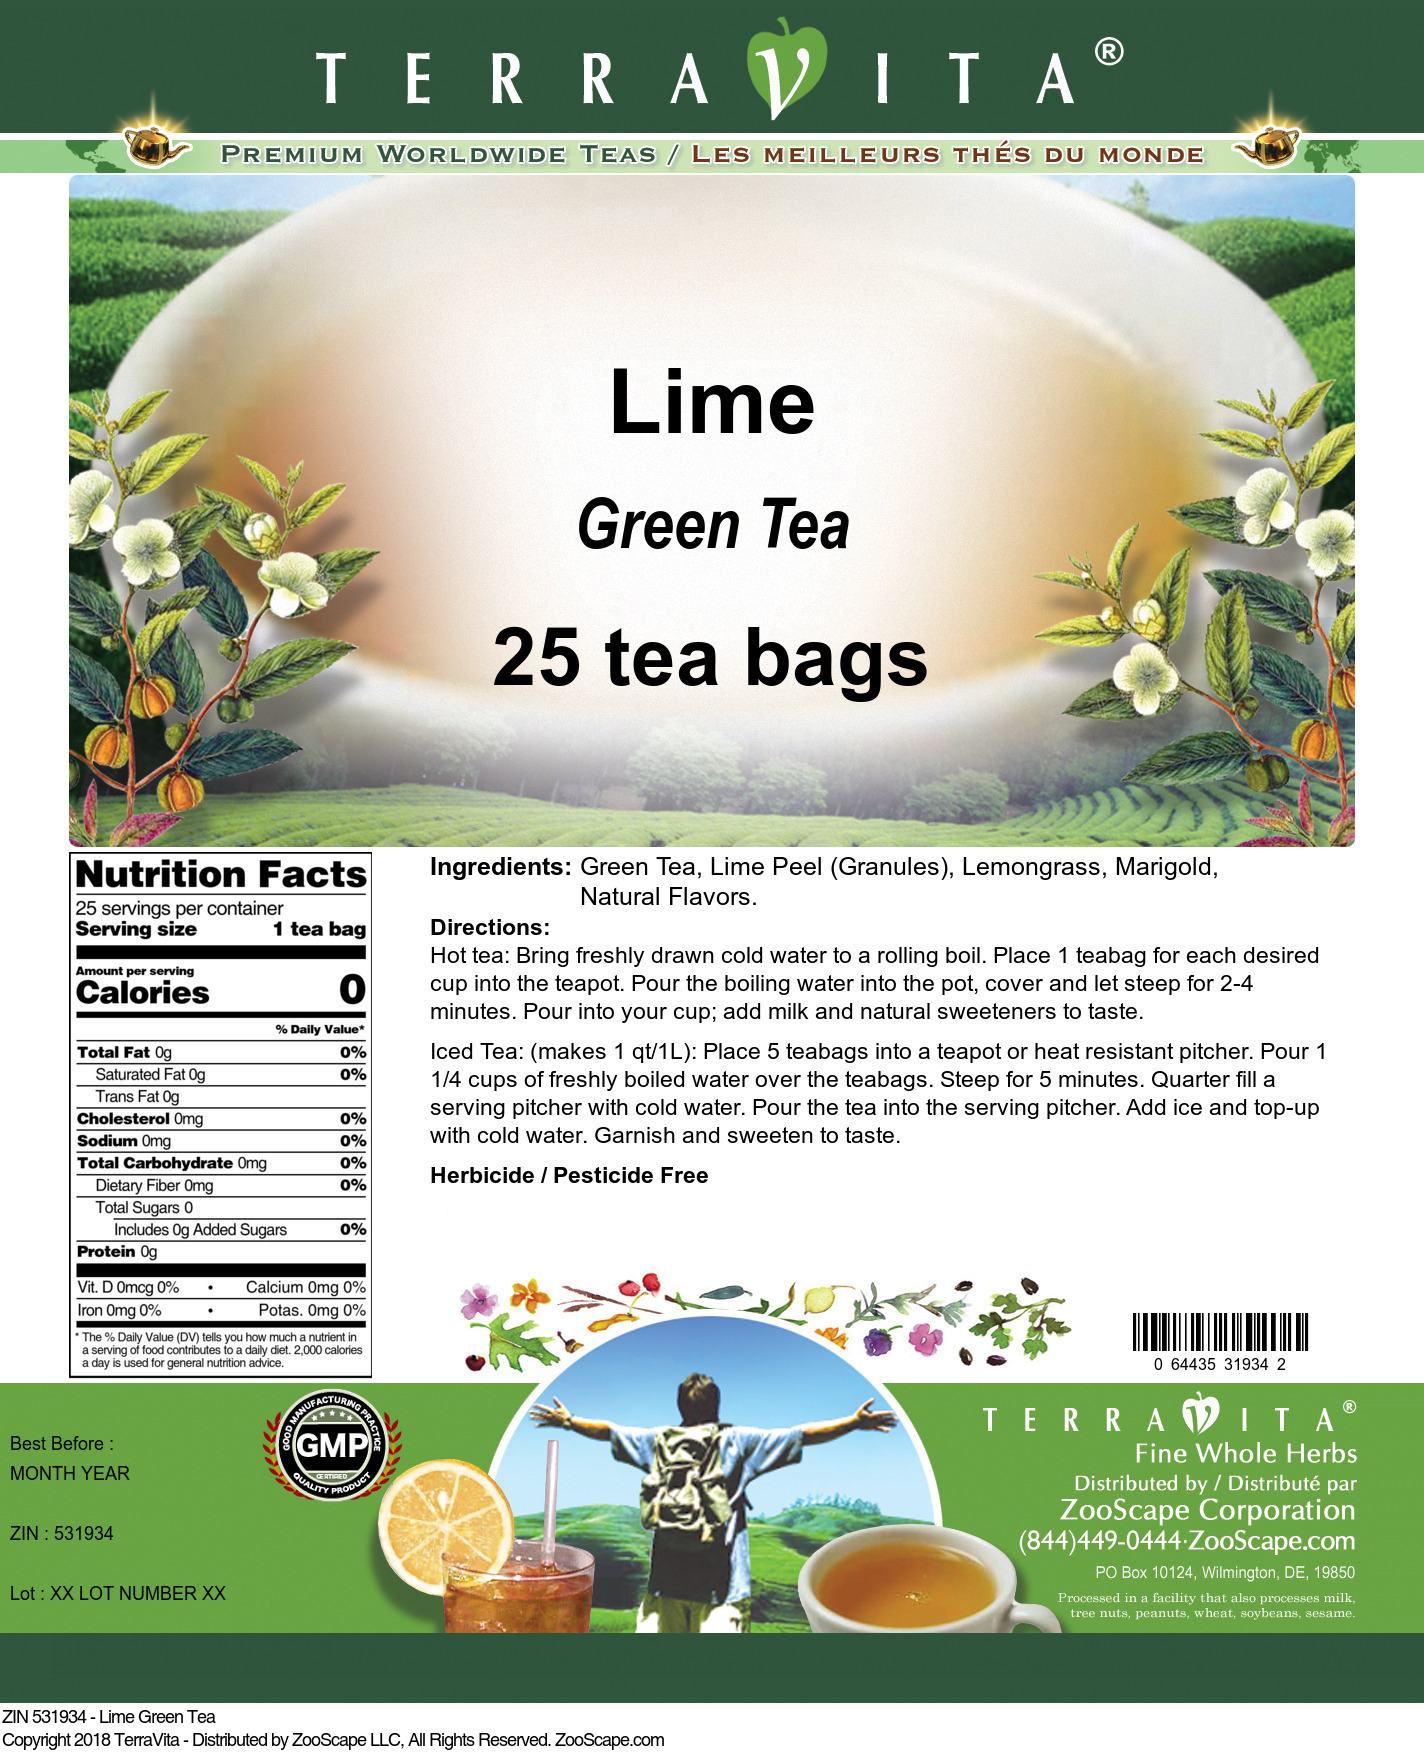 Lime Green Tea